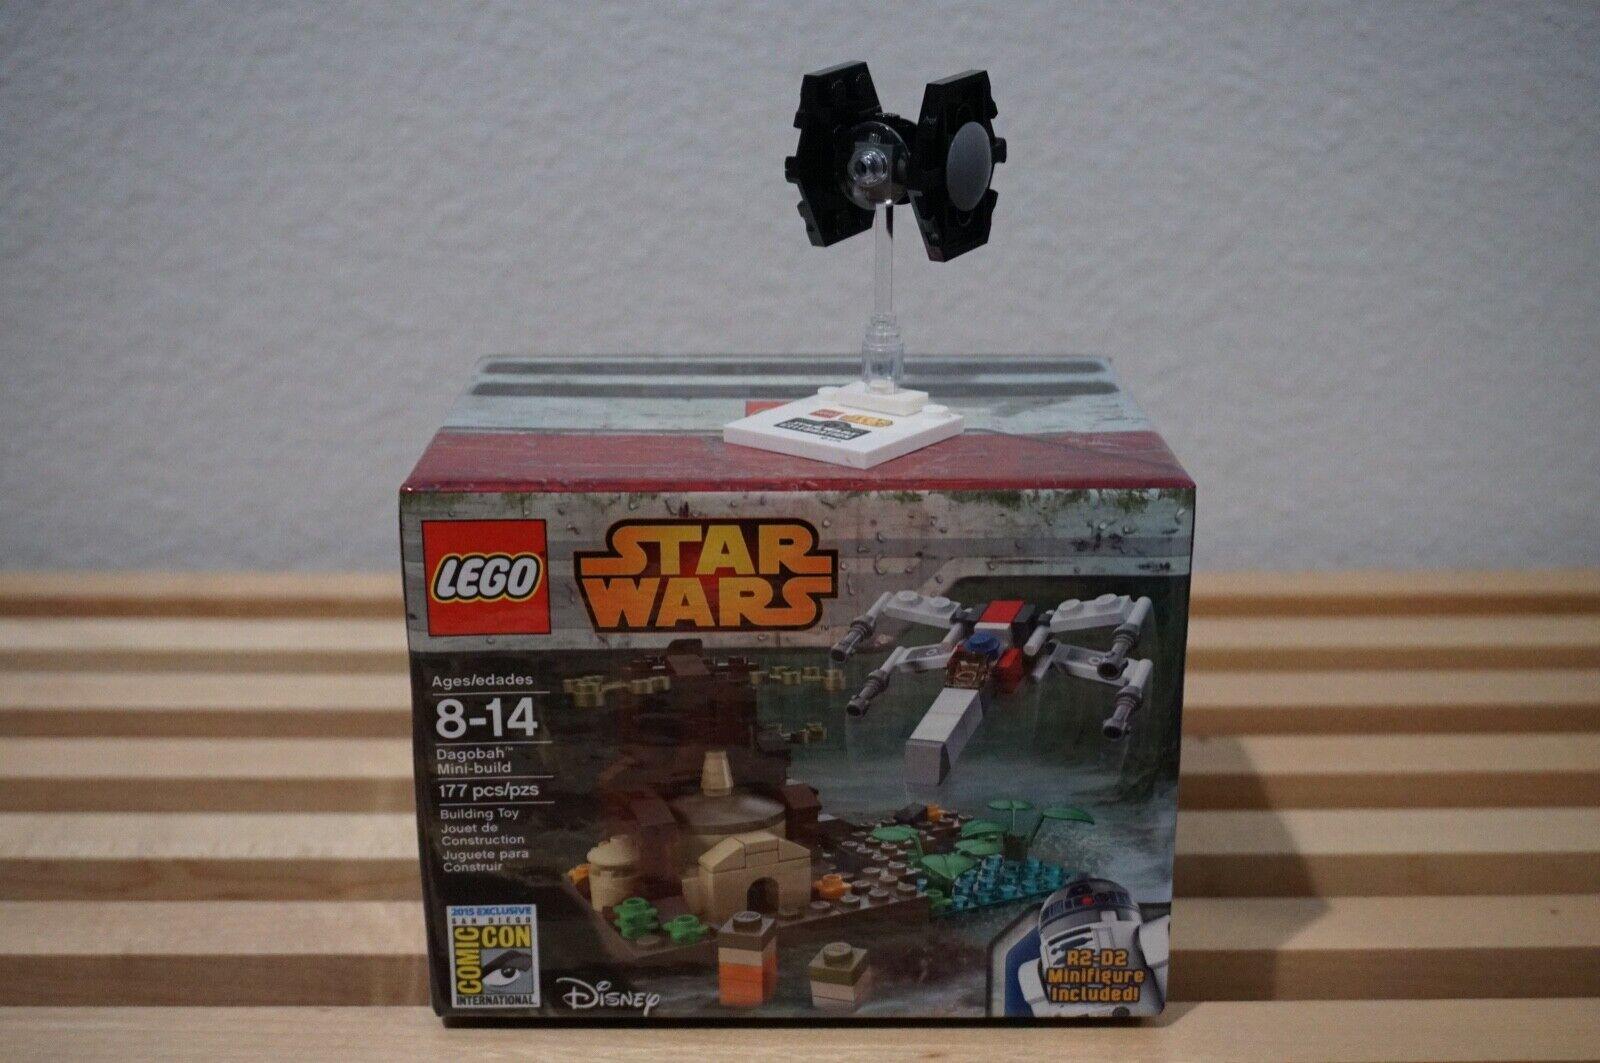 LEGO STAR WARS SDCC 2015 DAGOBAH MINI BUILD  1120 PLUS FREE MINI TIE FIGHTER NEW